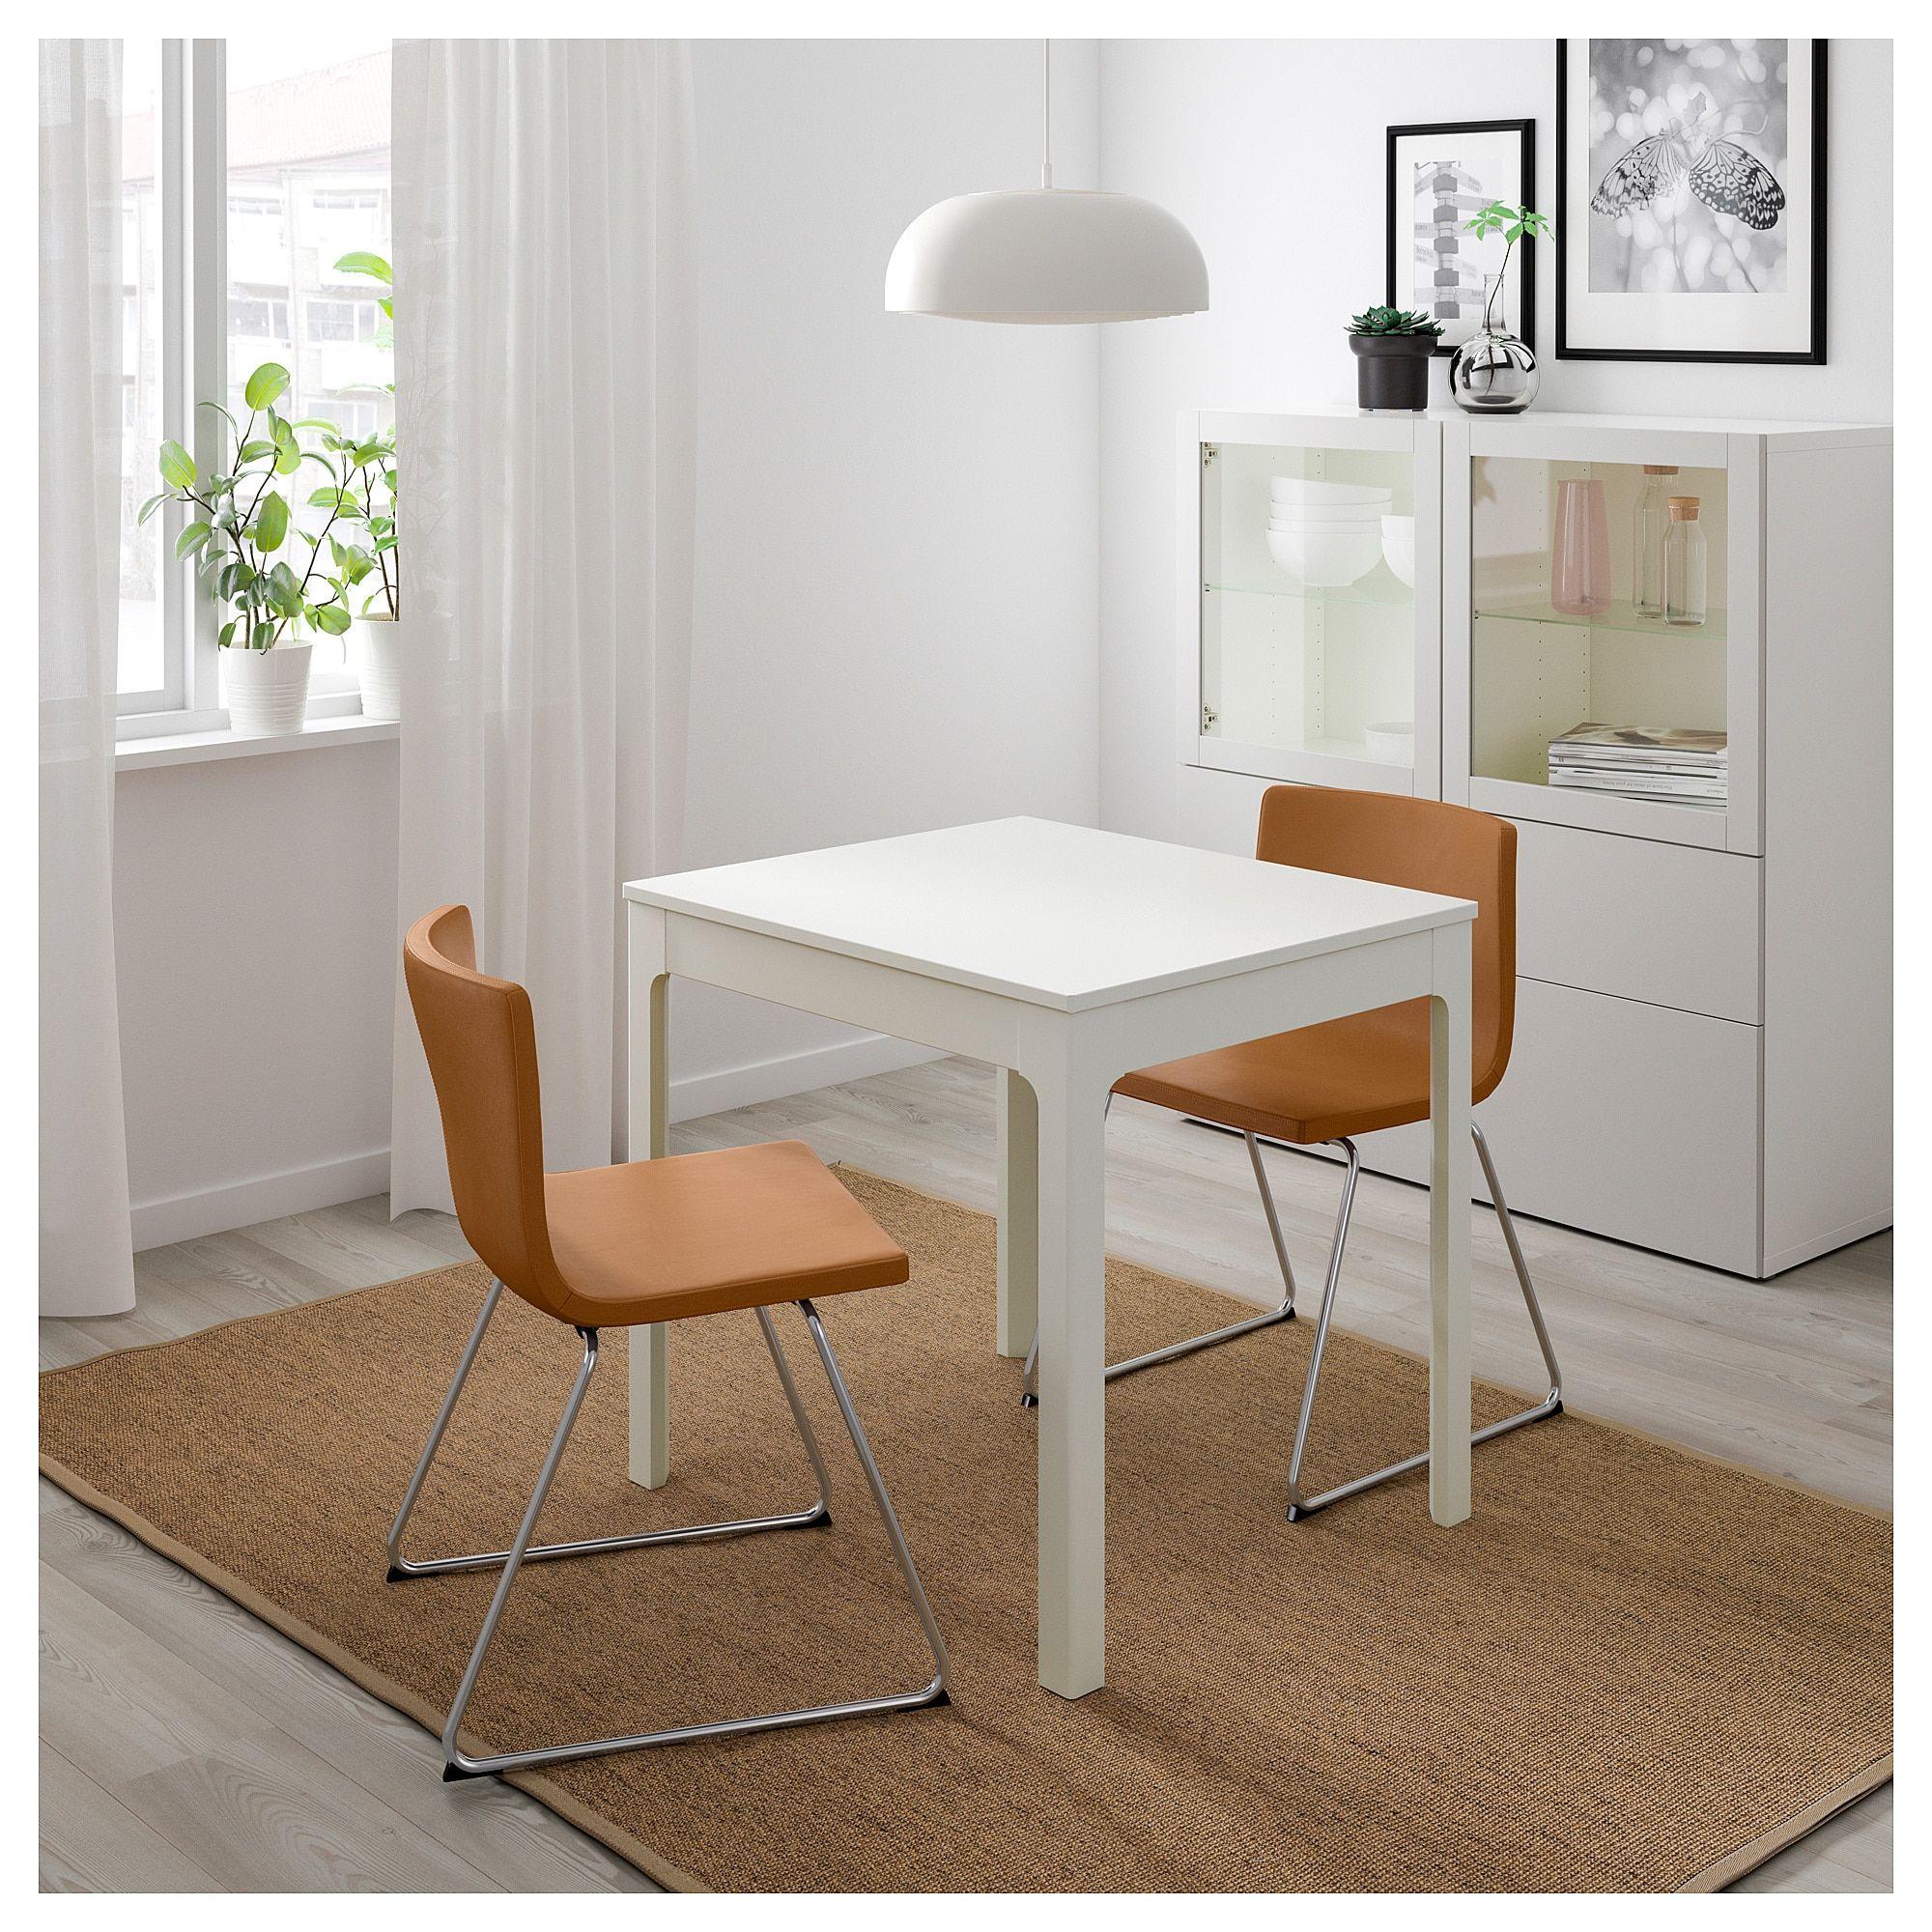 8da858223ba IKEA - EKEDALEN   BERNHARD Table and 2 chairs white